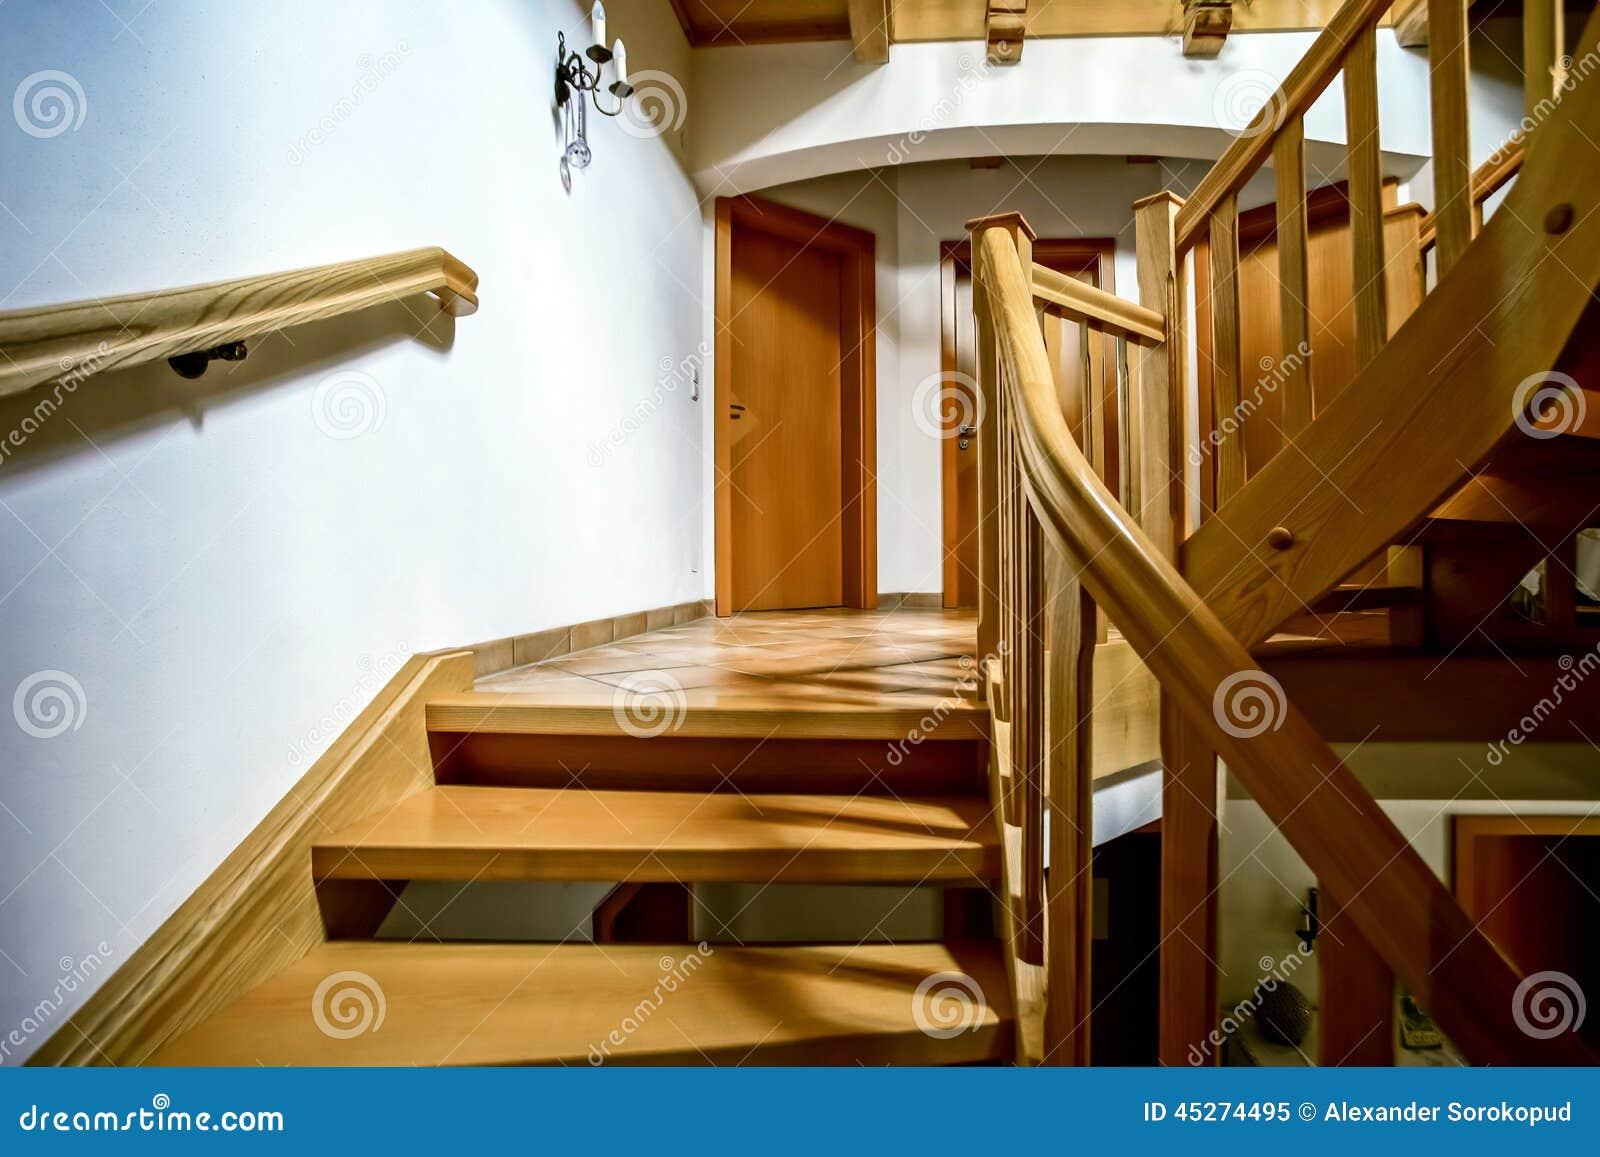 Wenteltrap In Woonkamer : Mooie houten wenteltrap stock afbeelding afbeelding bestaande uit